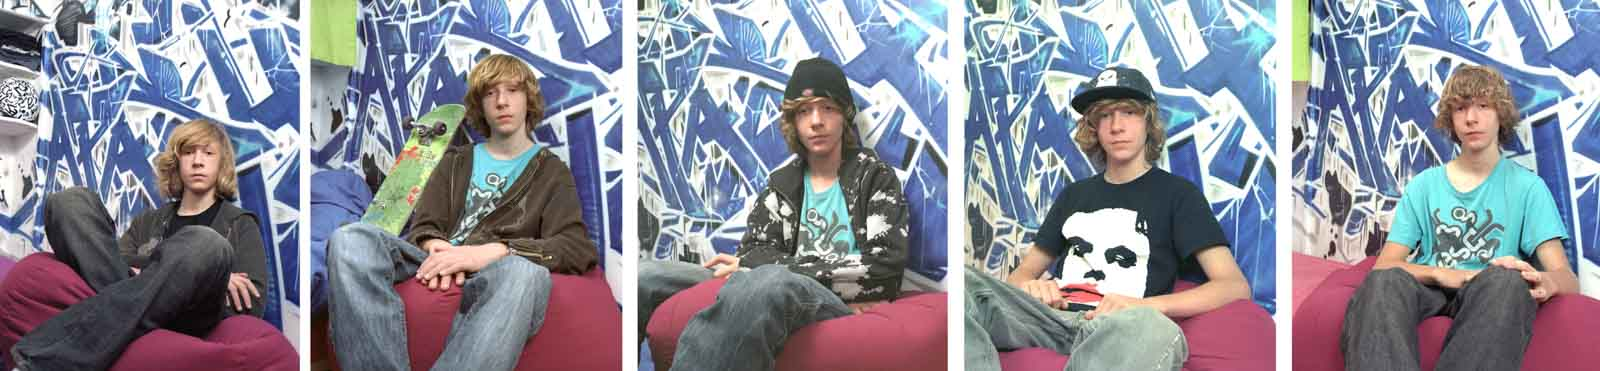 adolescents-7